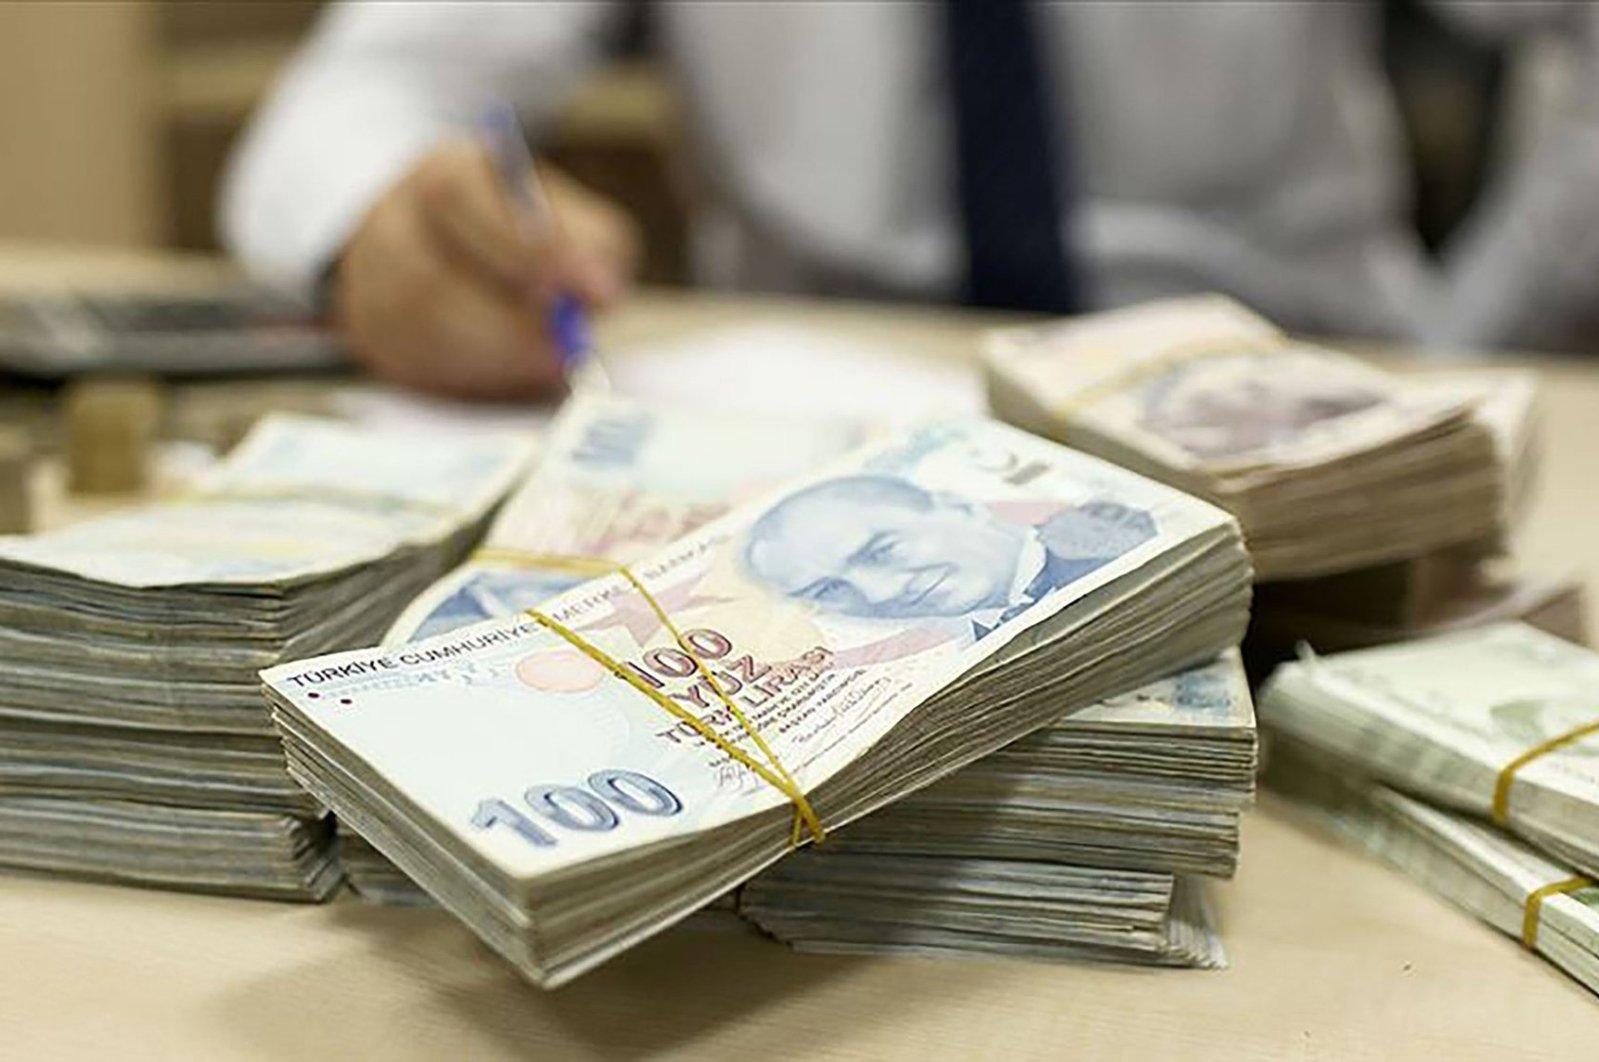 This Sabah file photo shows stacks of Turkish lira.